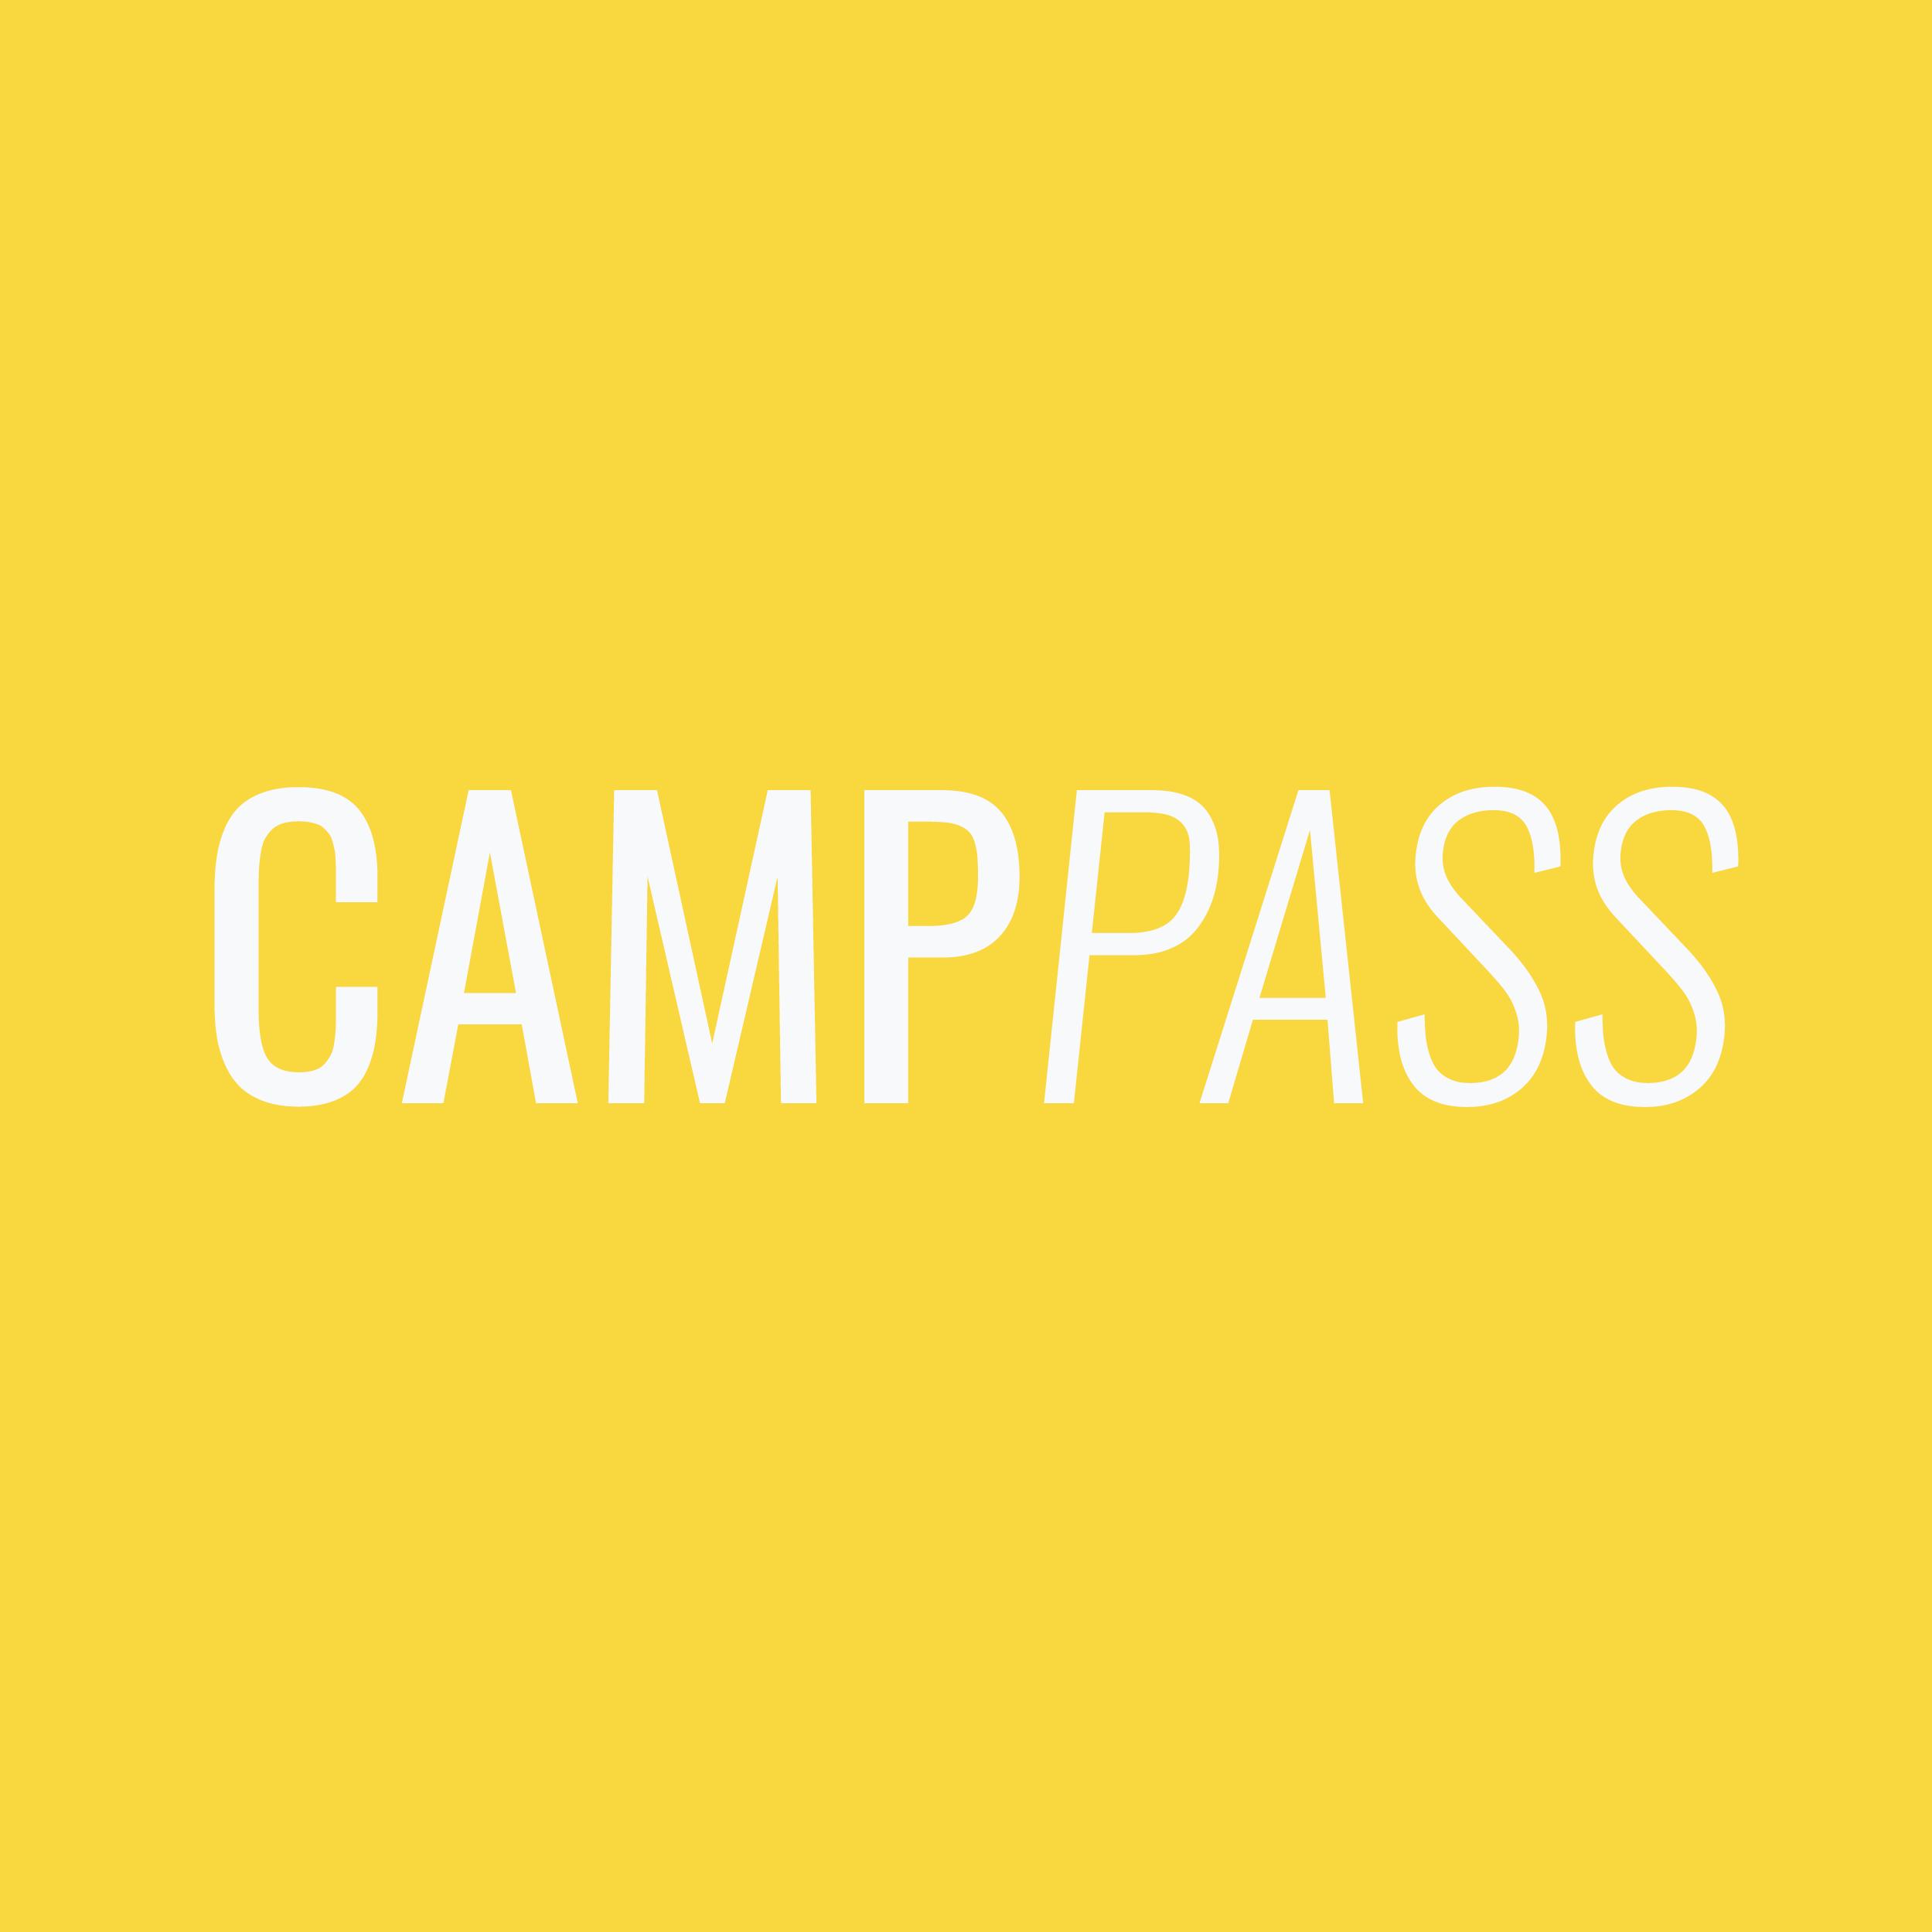 CampPass.png